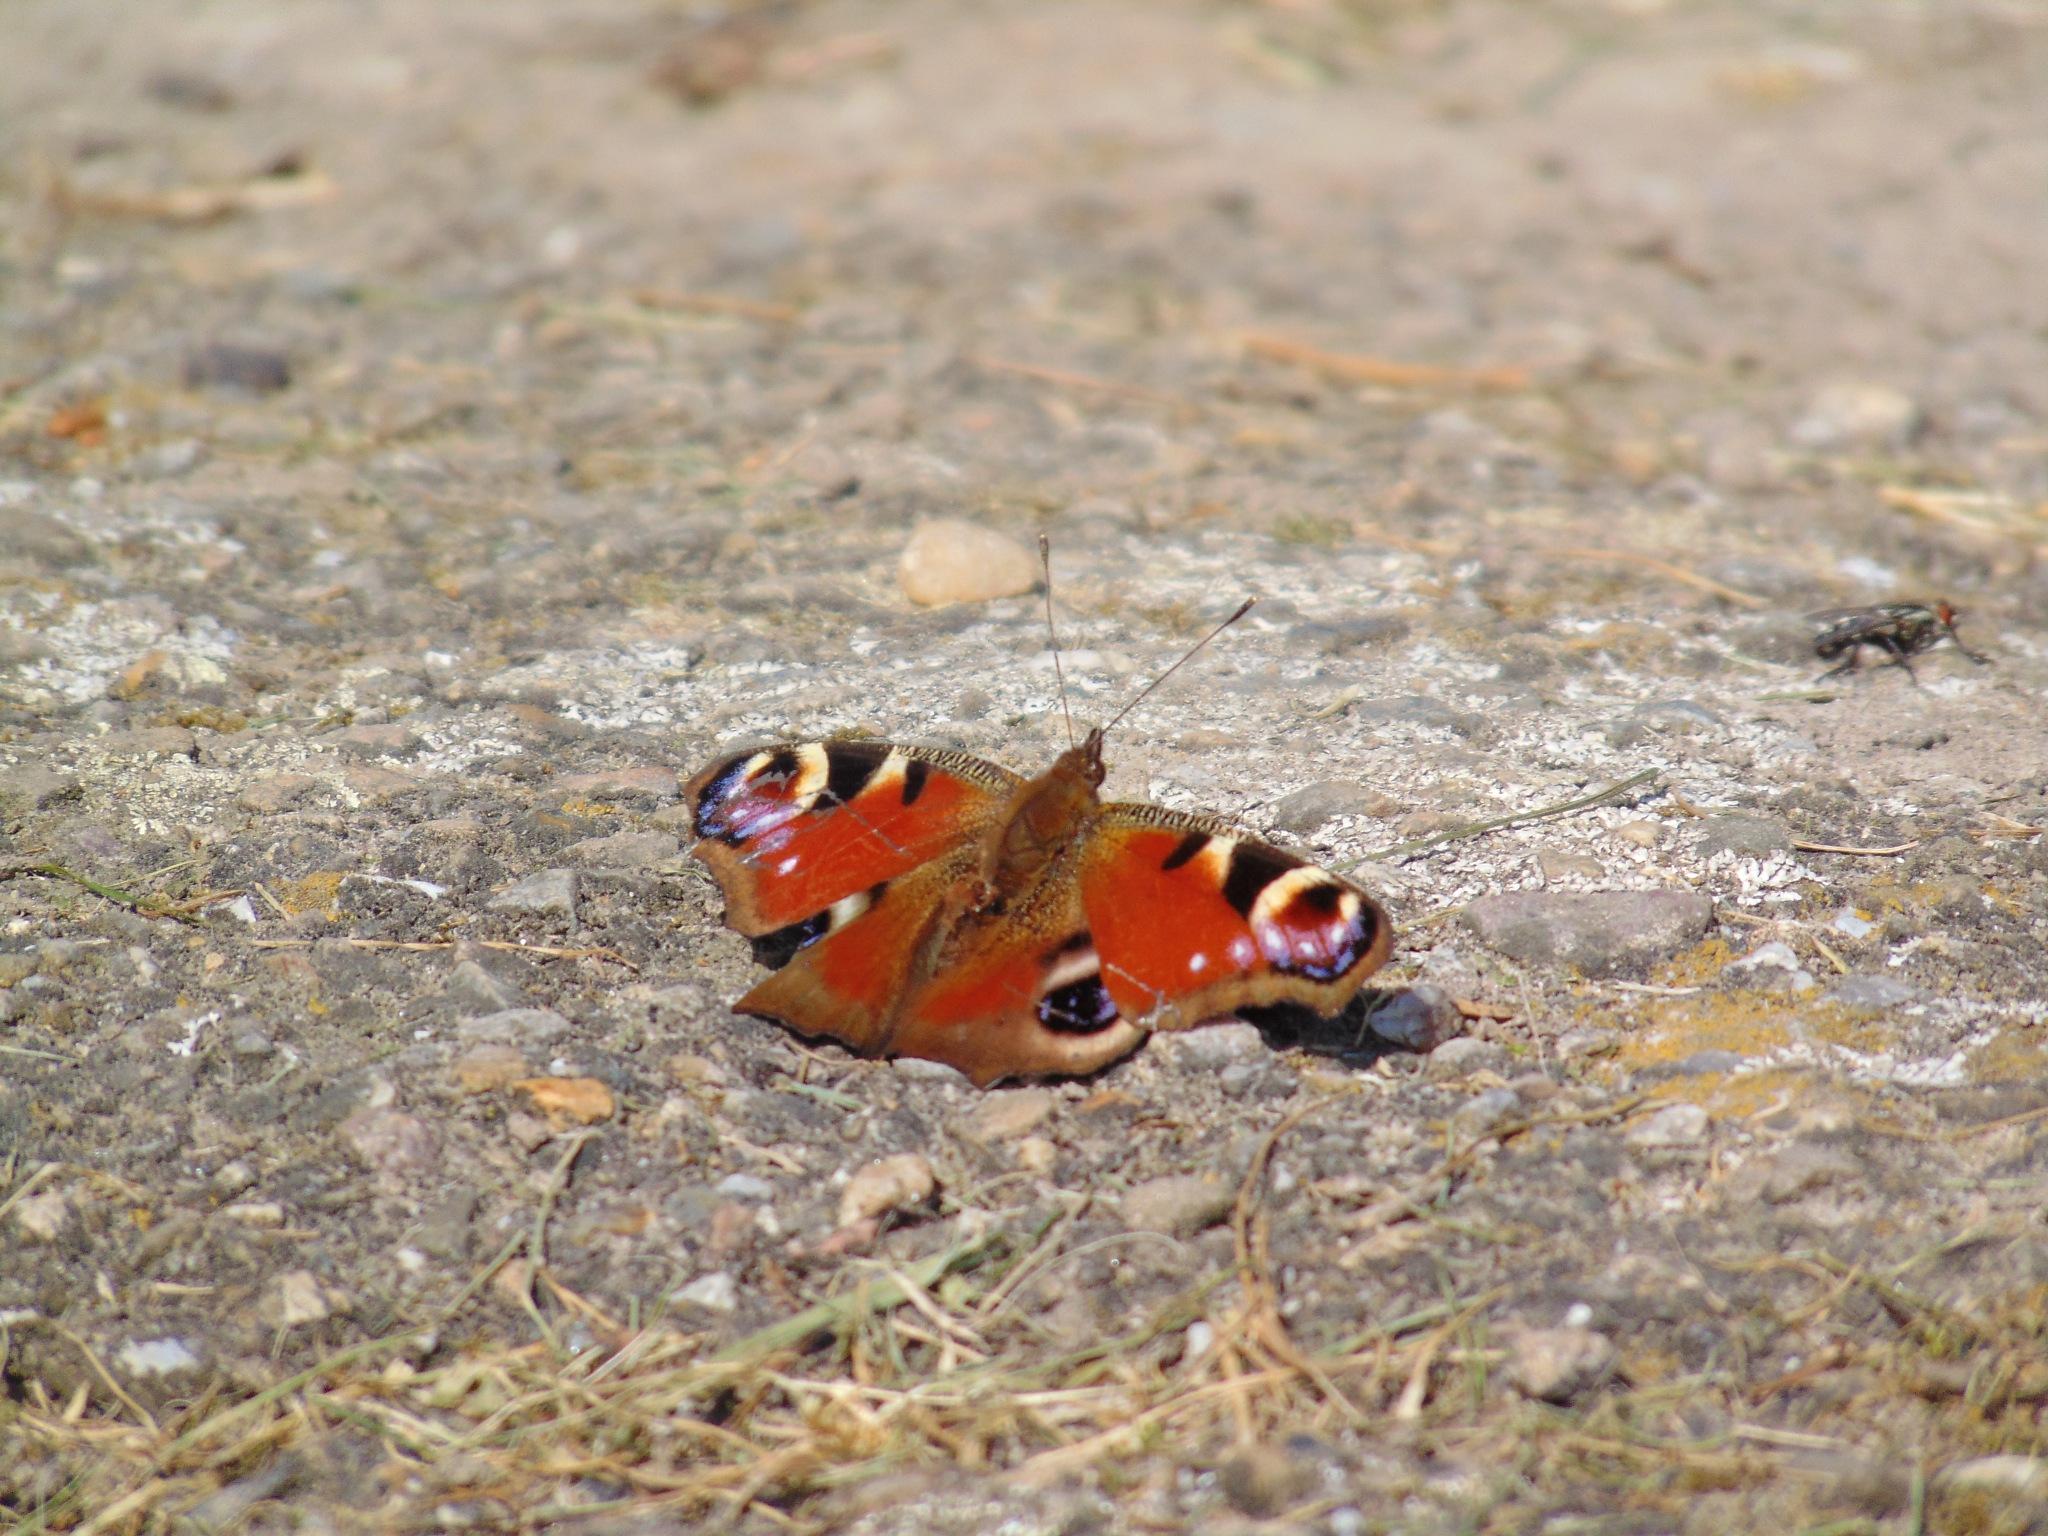 Butterfly by Hilco Hoogendam